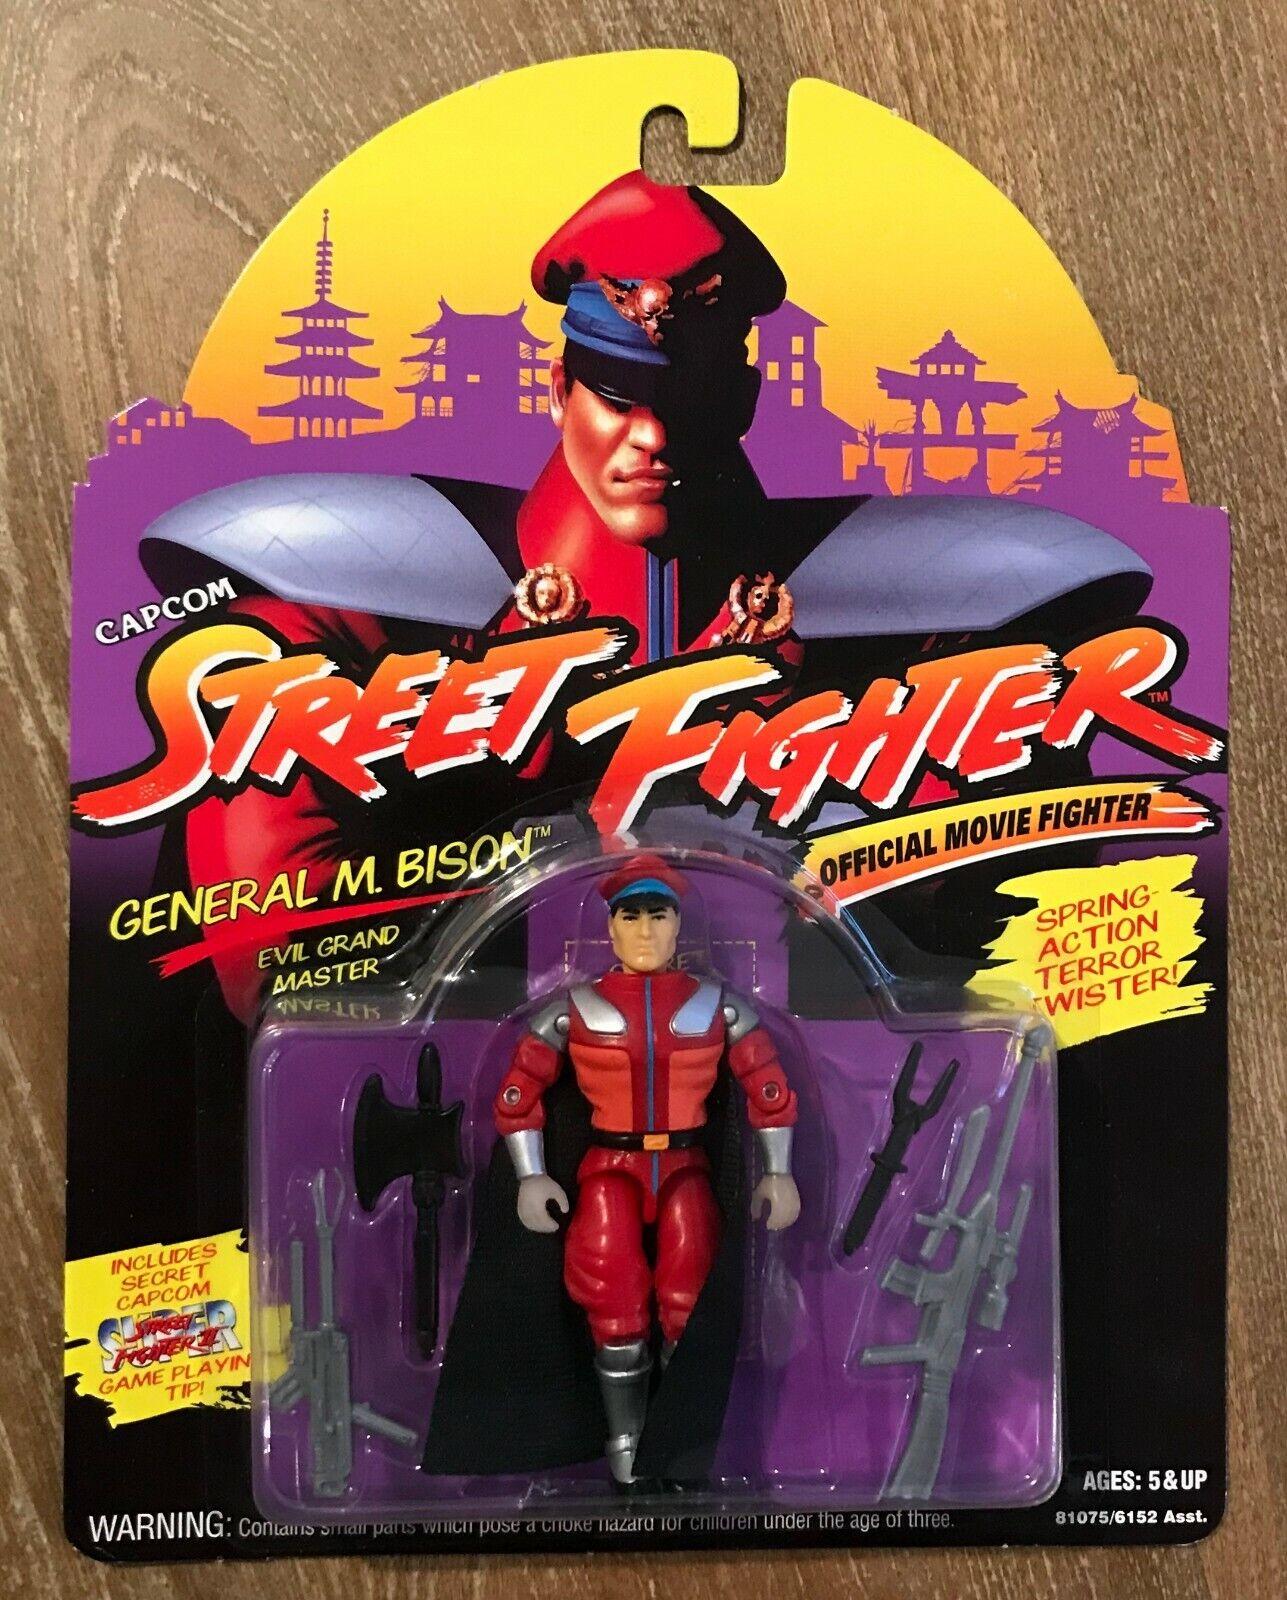 Hasbro 1994 Street Fighter The Movie General M Bison Moc G I Joe